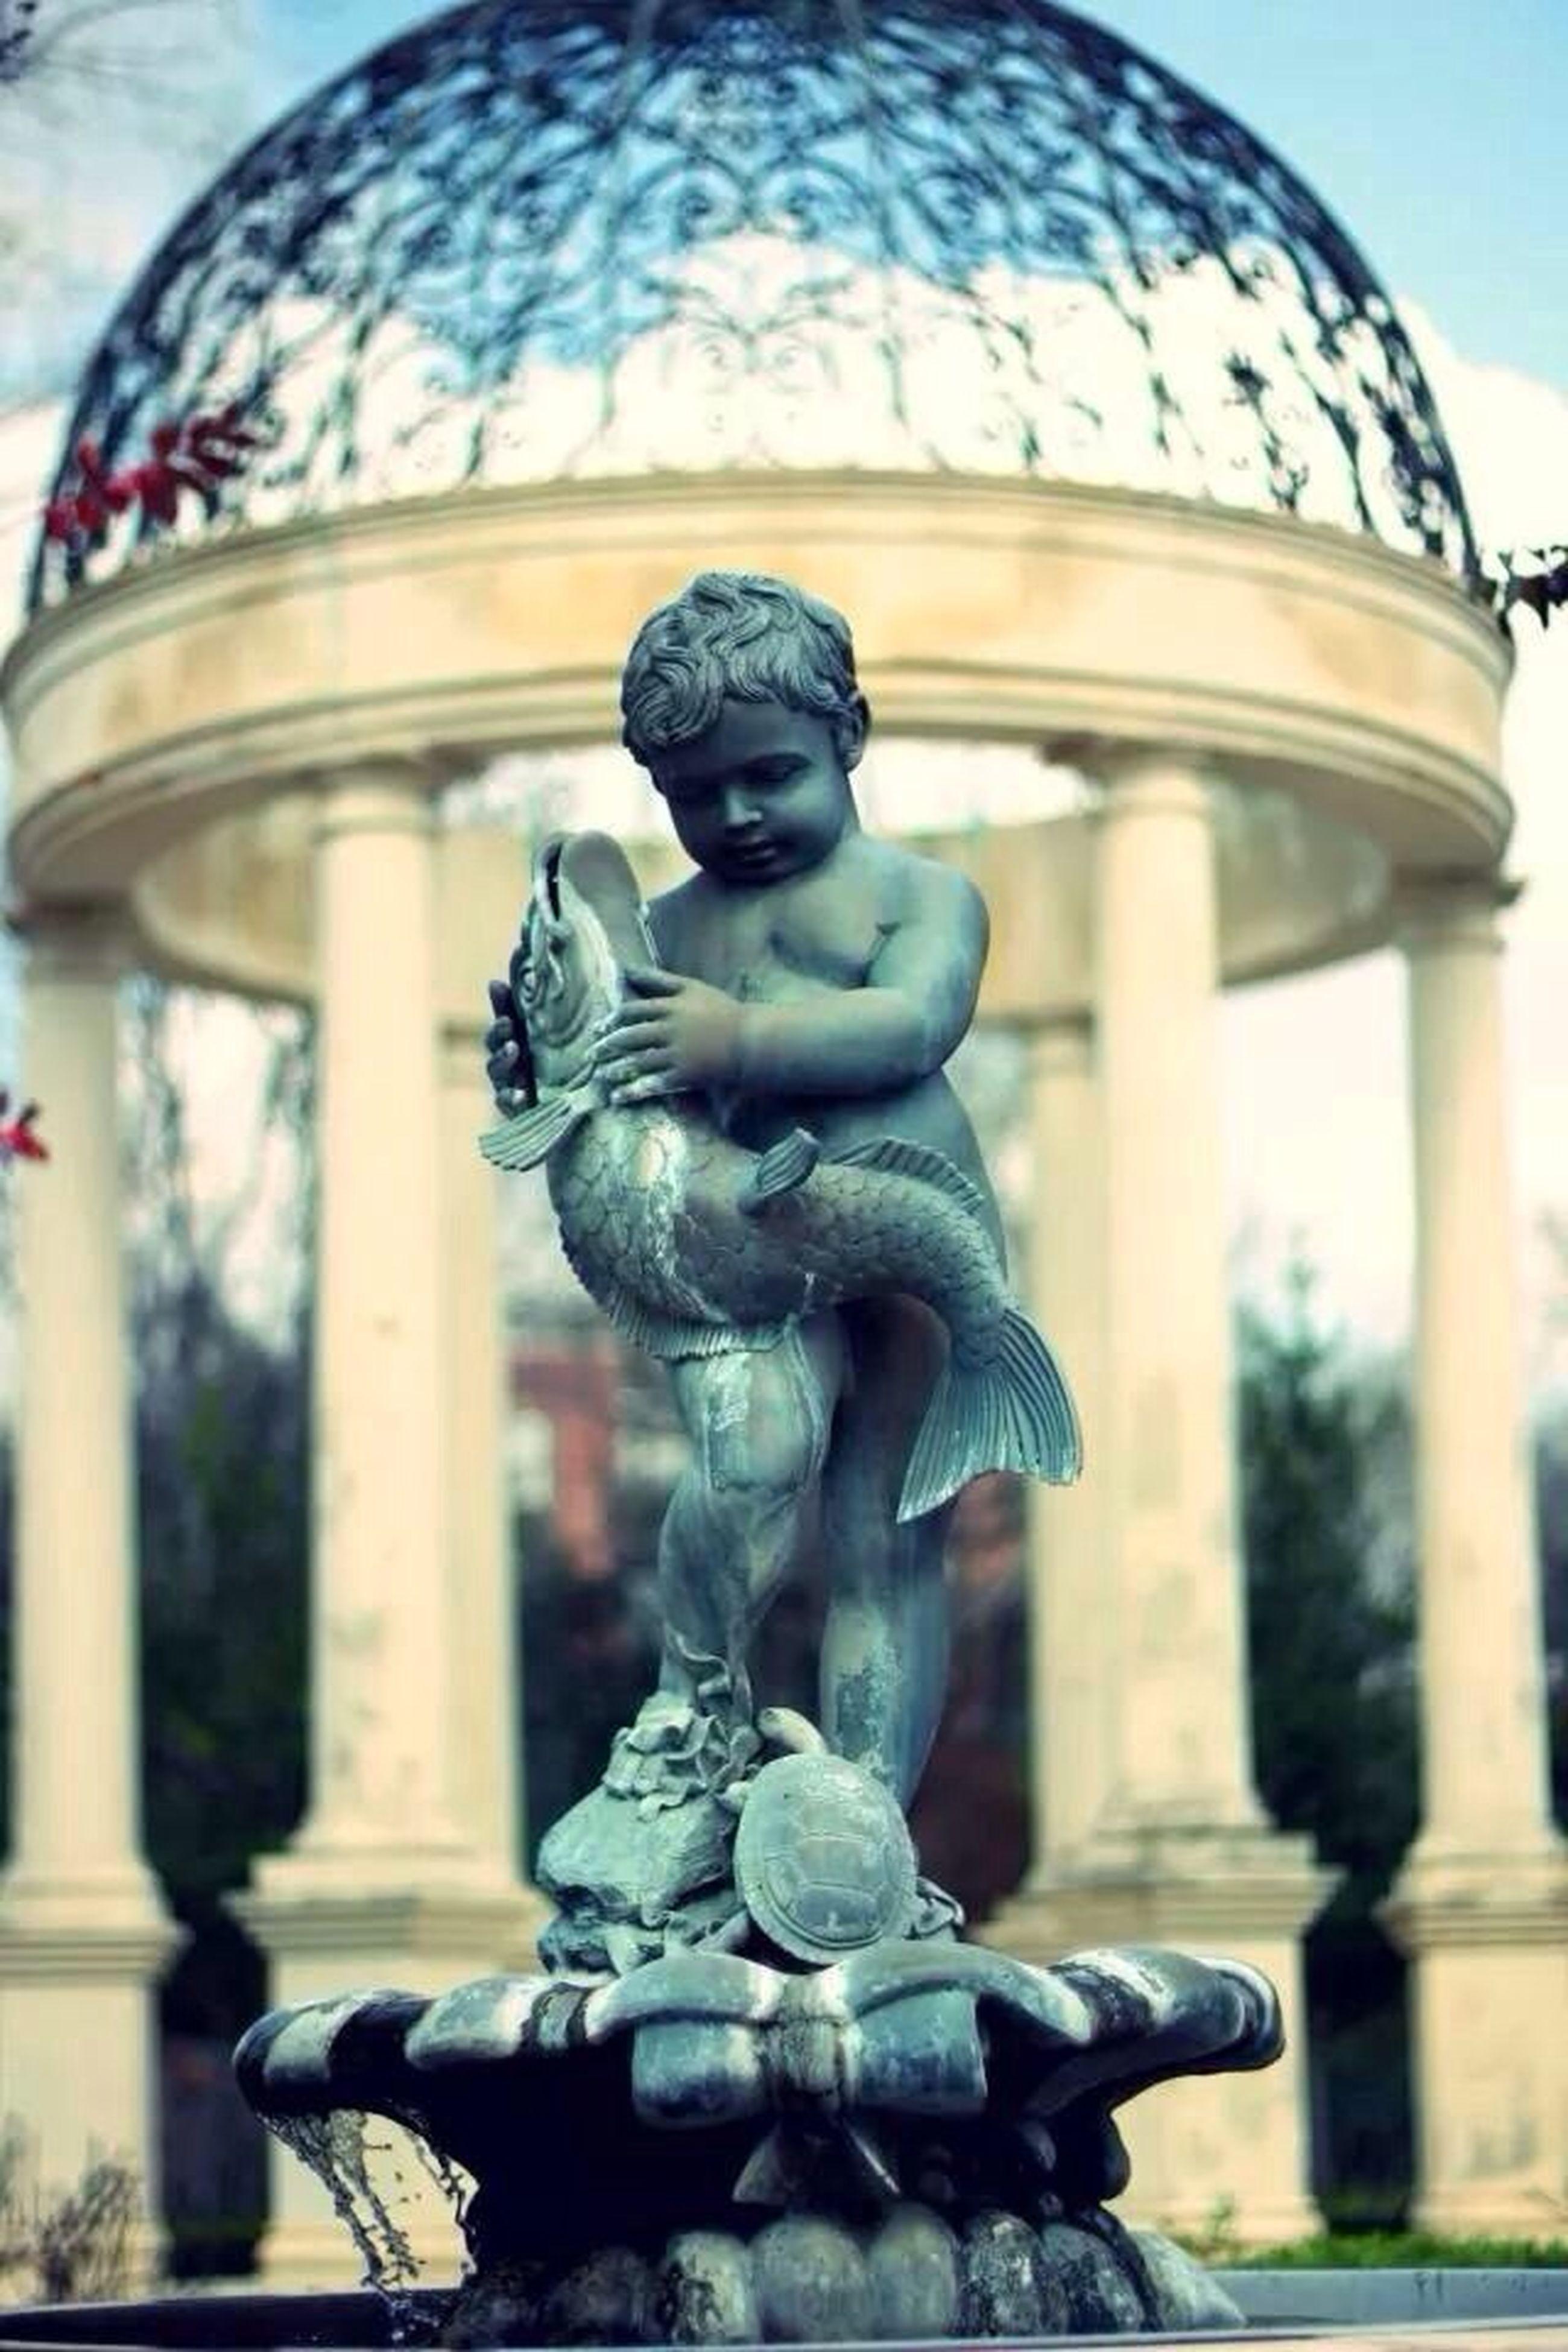 statue, sculpture, human representation, art and craft, art, creativity, fountain, famous place, travel destinations, architecture, travel, low angle view, international landmark, built structure, animal representation, tourism, monument, building exterior